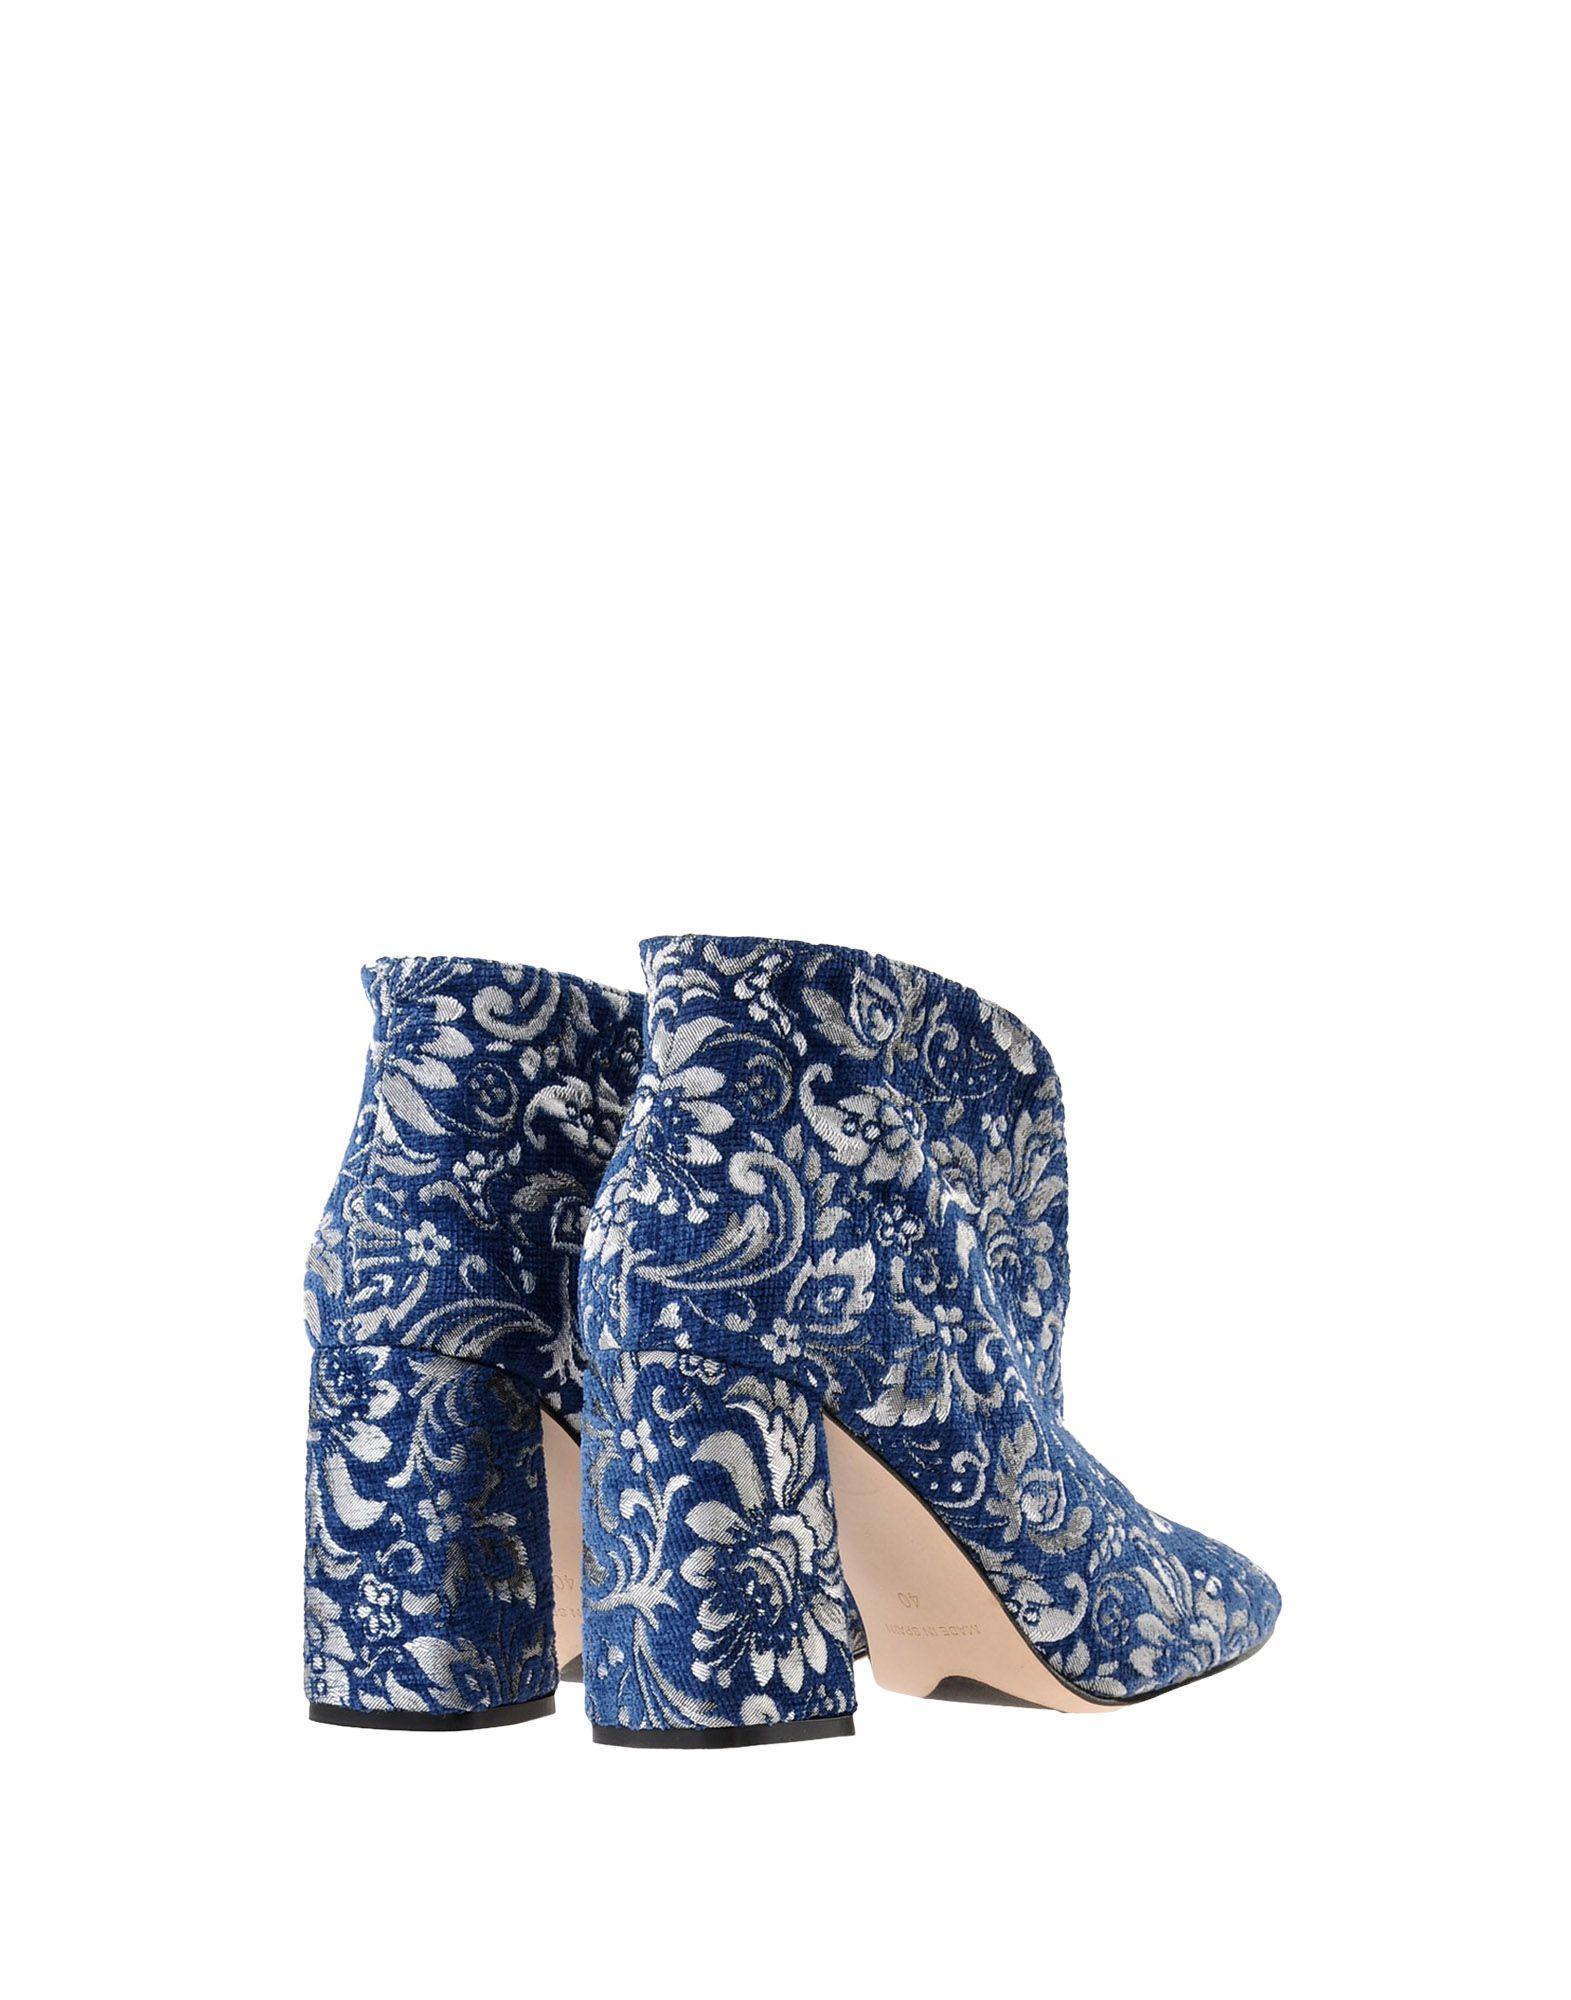 Stilvolle billige Schuhe George J. Love Stiefelette Damen  11541718OL